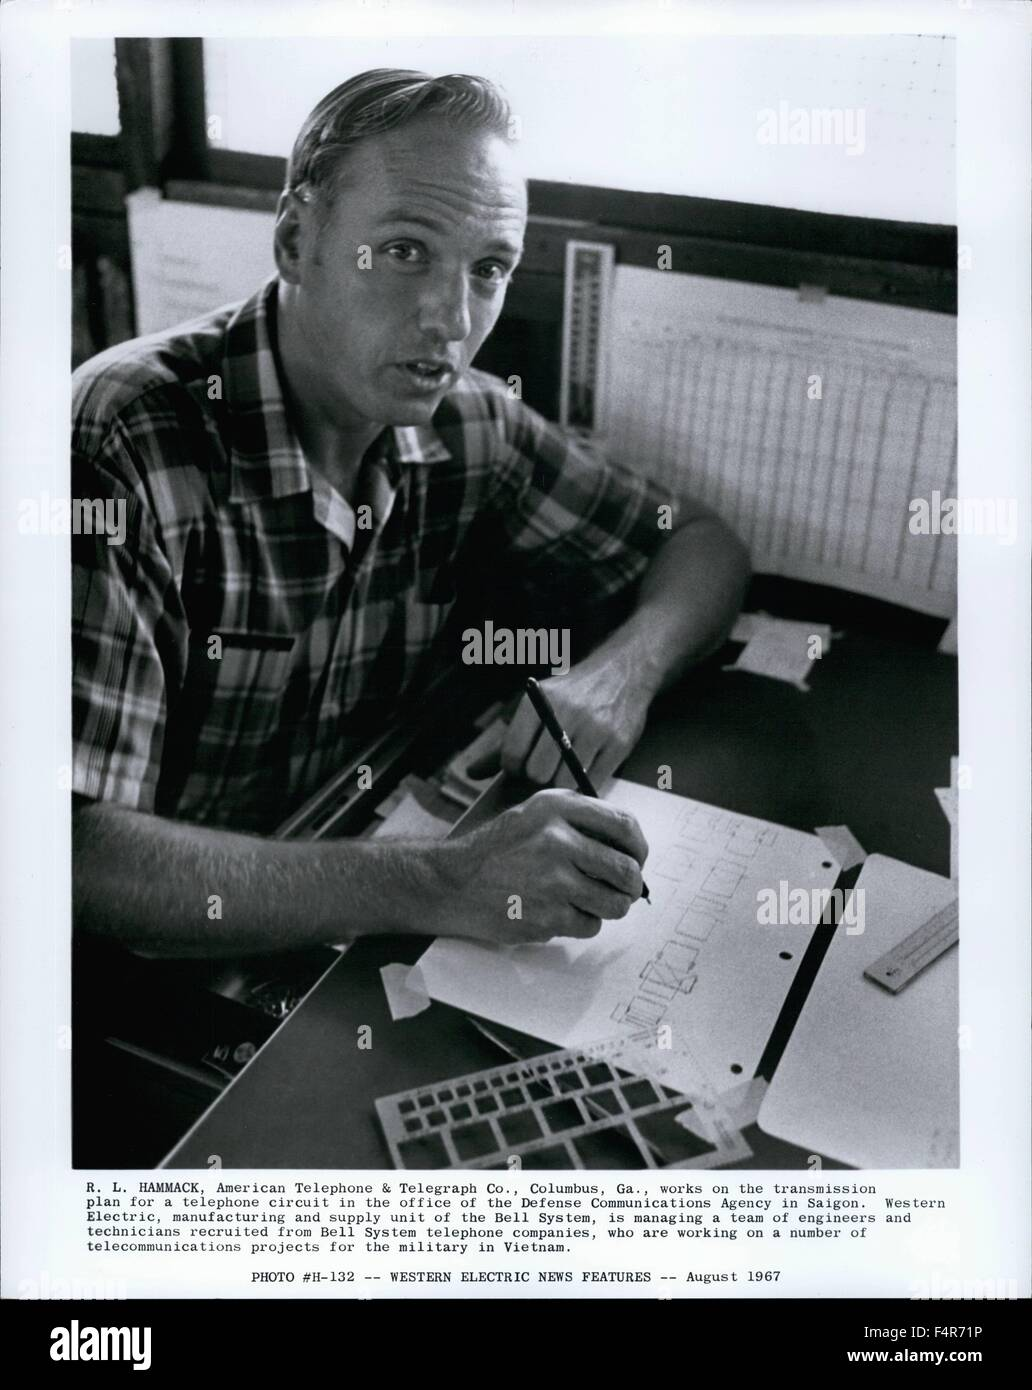 1964 - R. L. HANKACK, American Telephone & Telegraph Co., Columbus, Ga., works on the transmission plan for - Stock Image